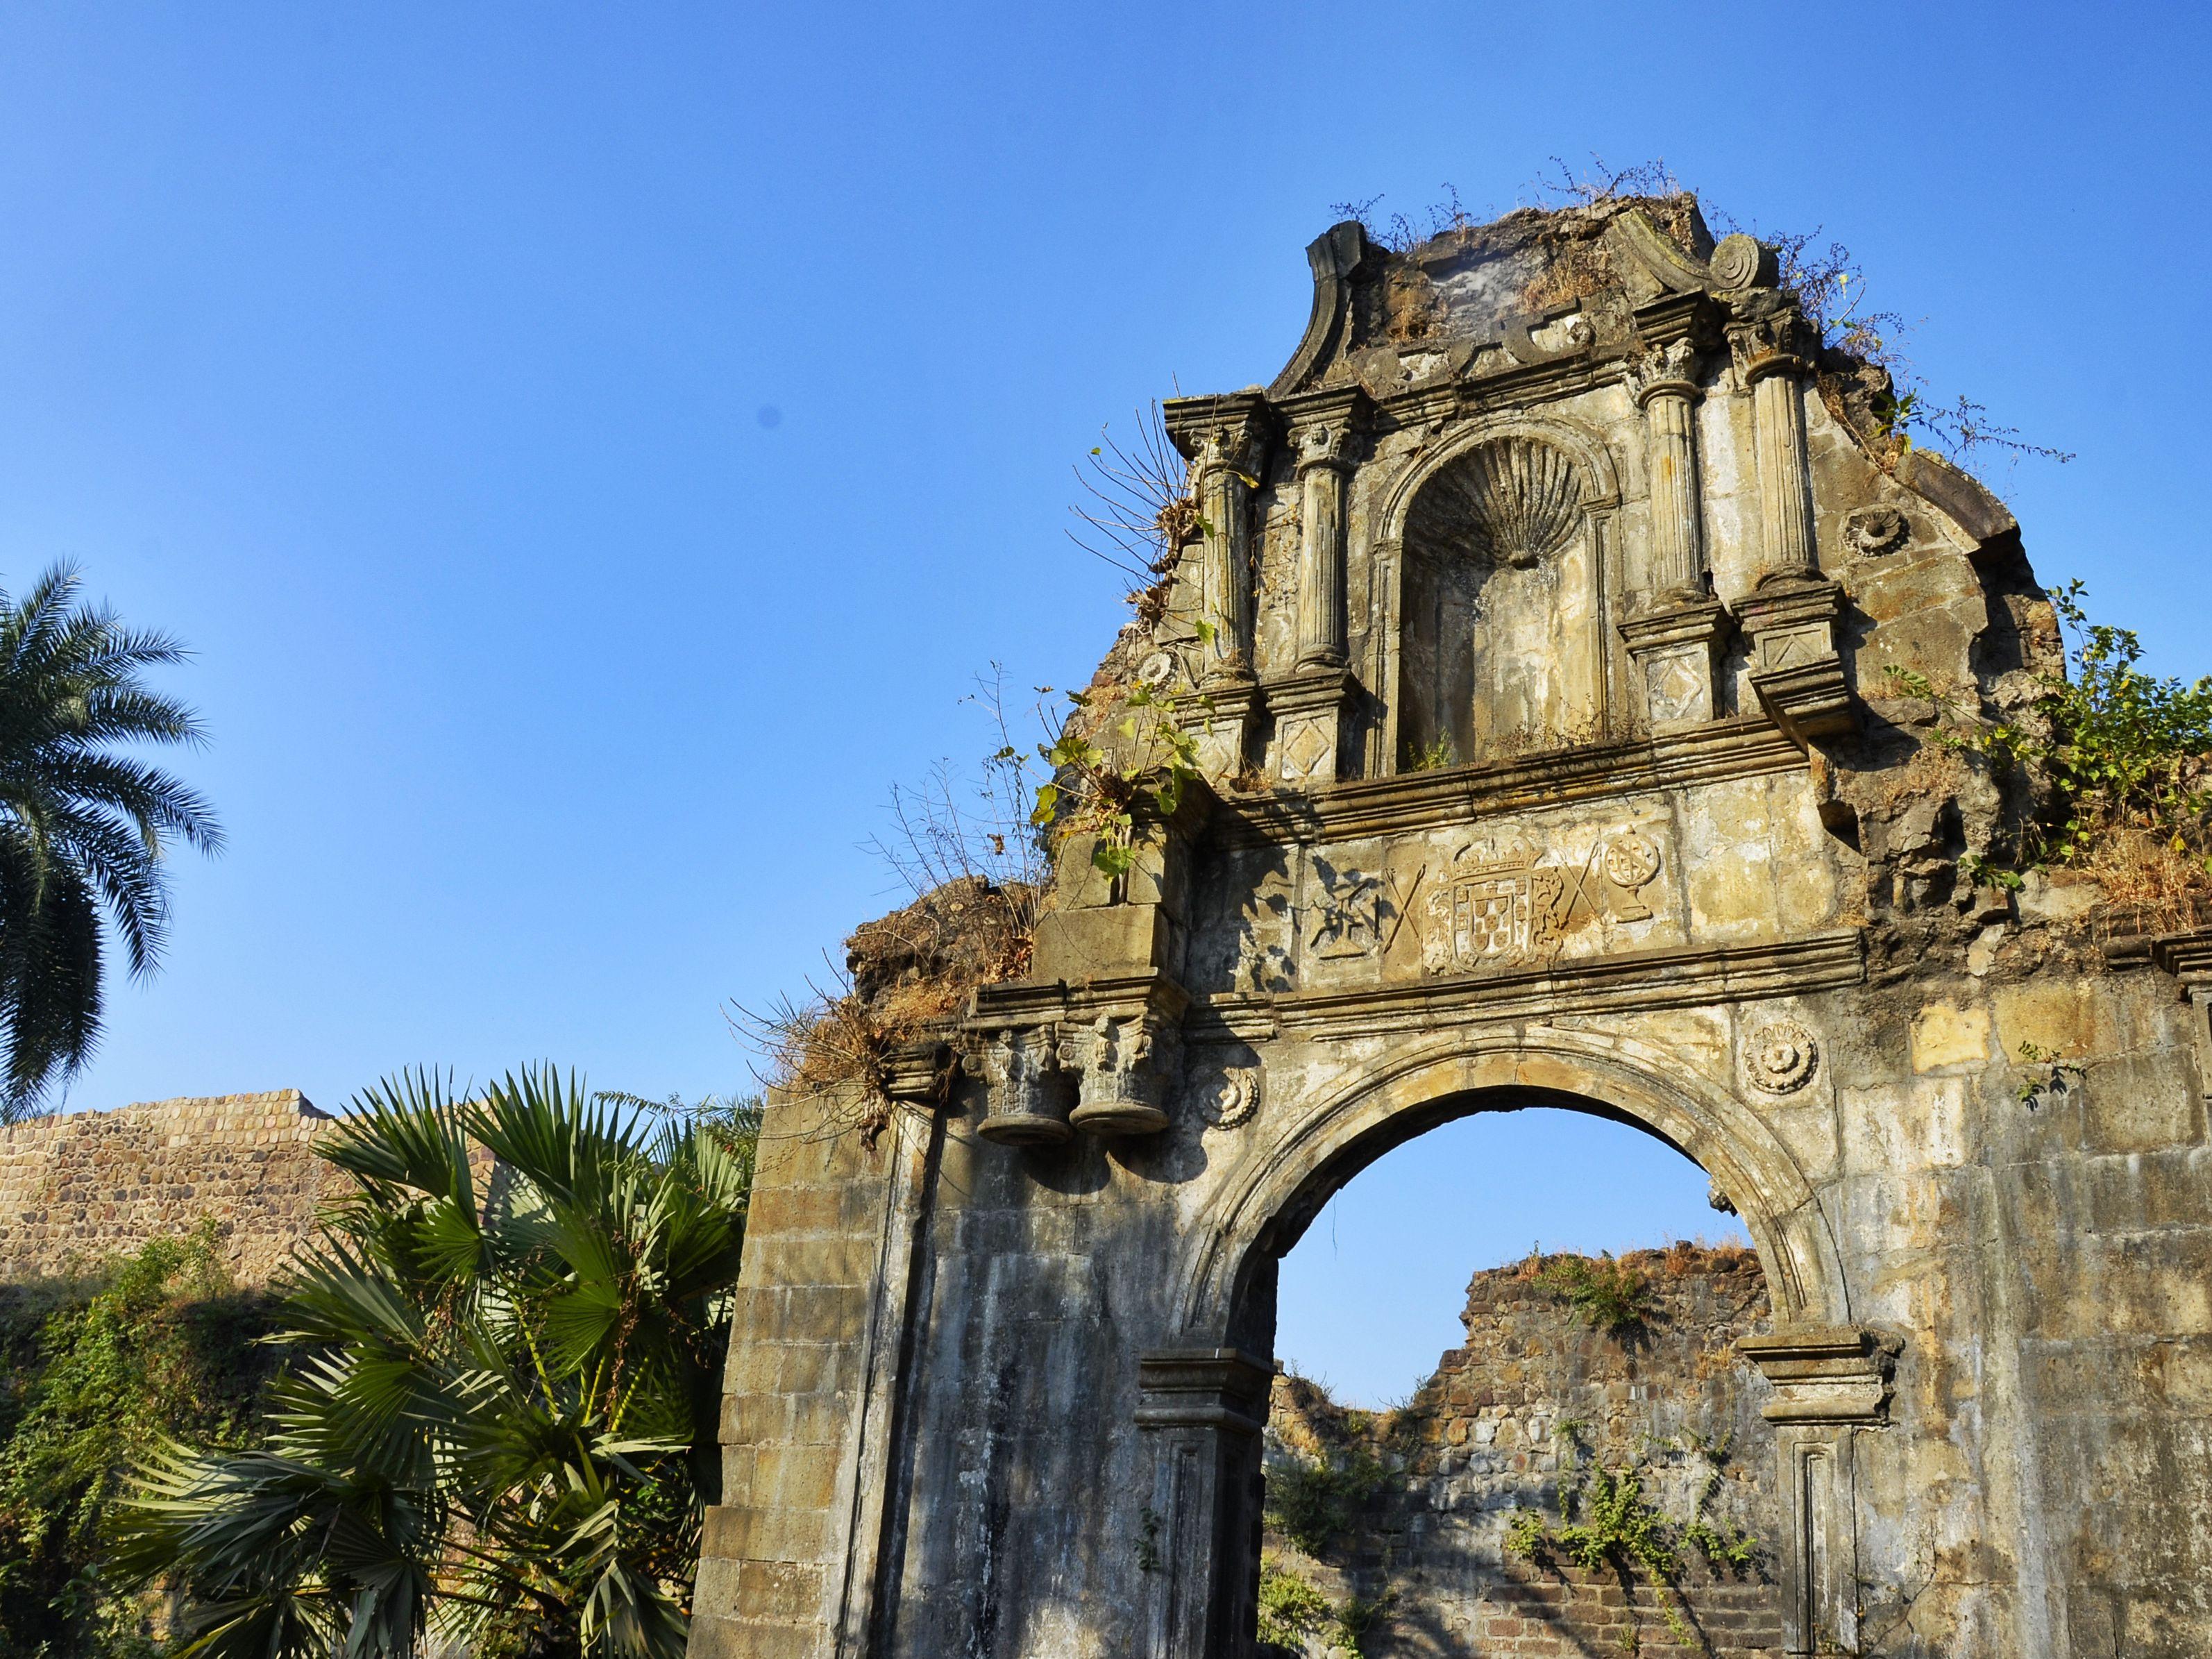 Historic Vasai Fort Near Mumbai: A Look Inside